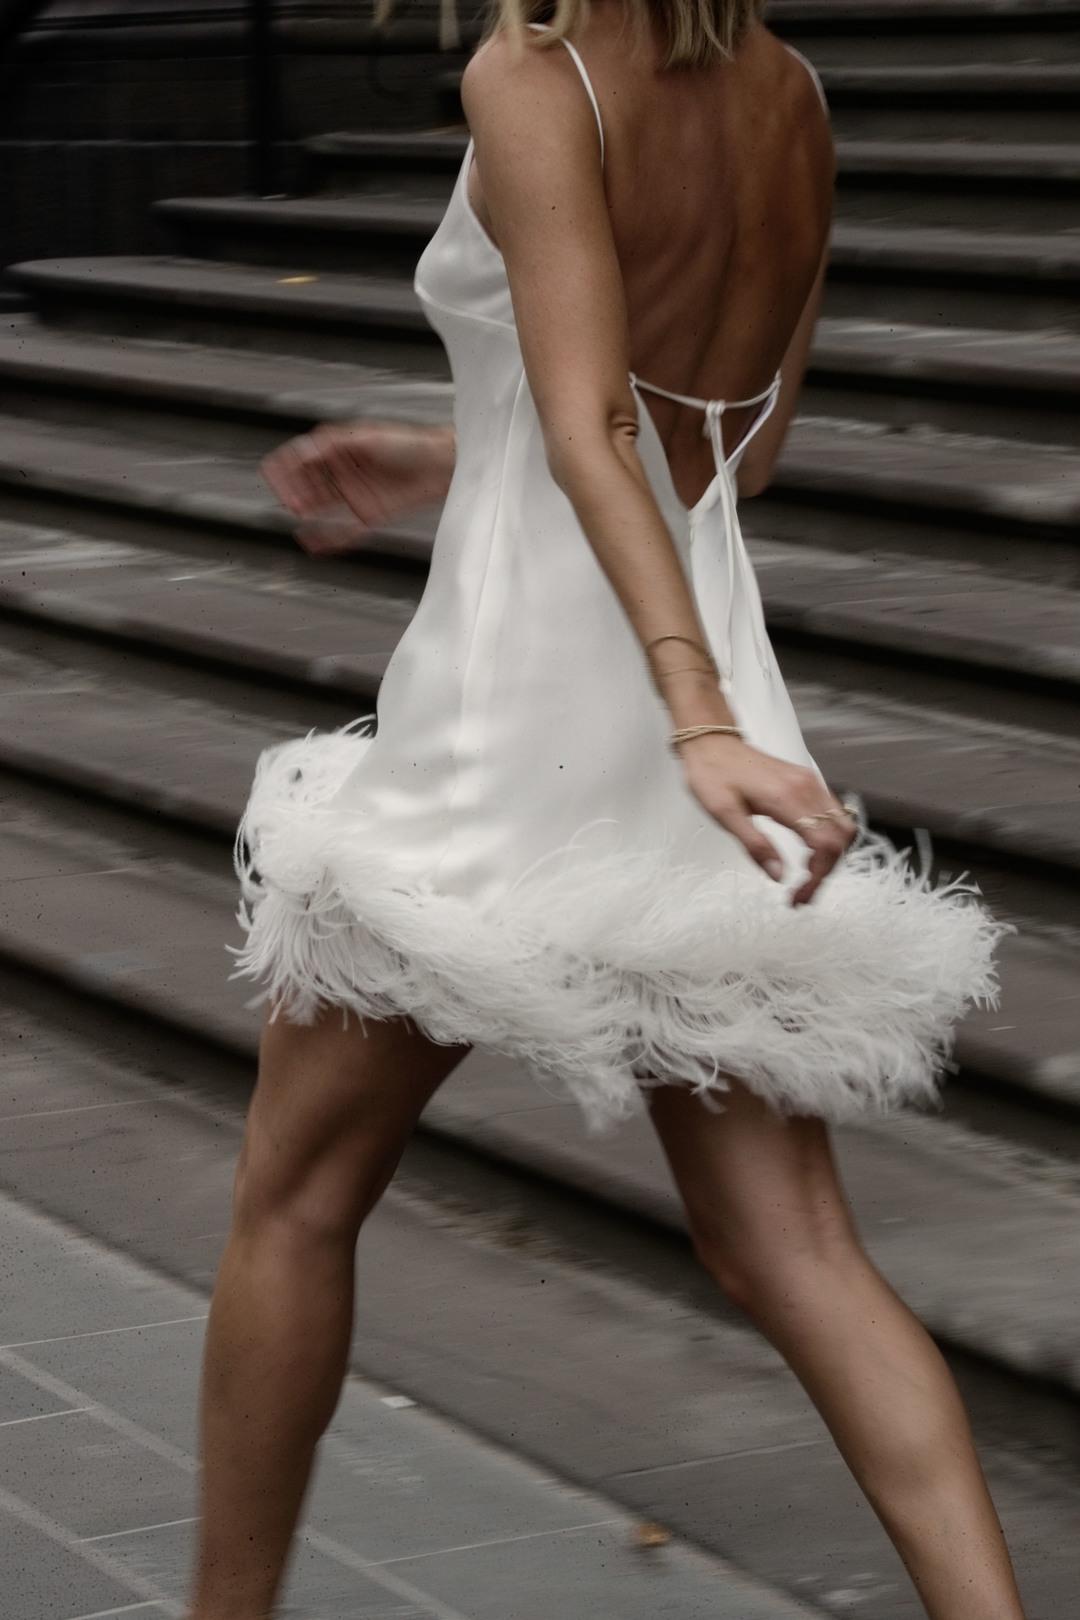 sherry dress photo